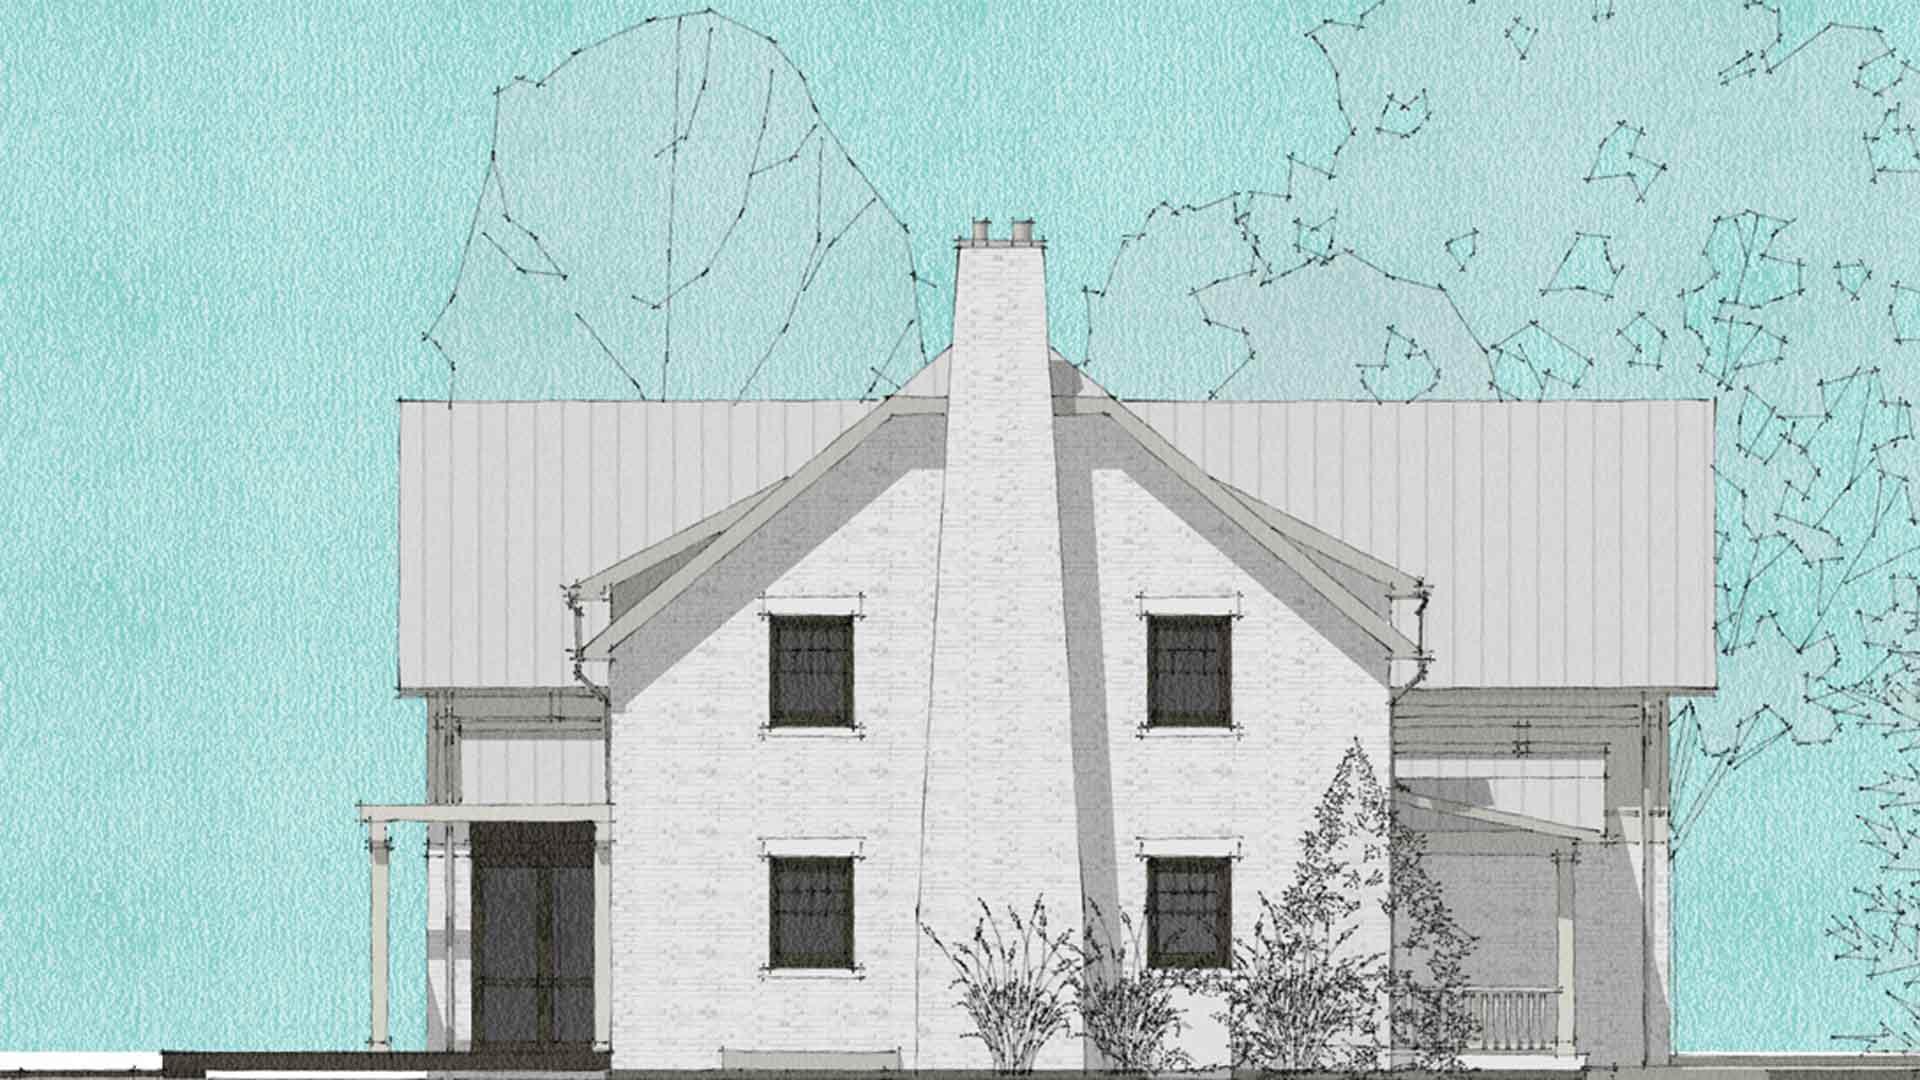 (Rendering) East Exterior Elevation Study - Butler Tarkington Modern Tudor - Indianapolis, IN